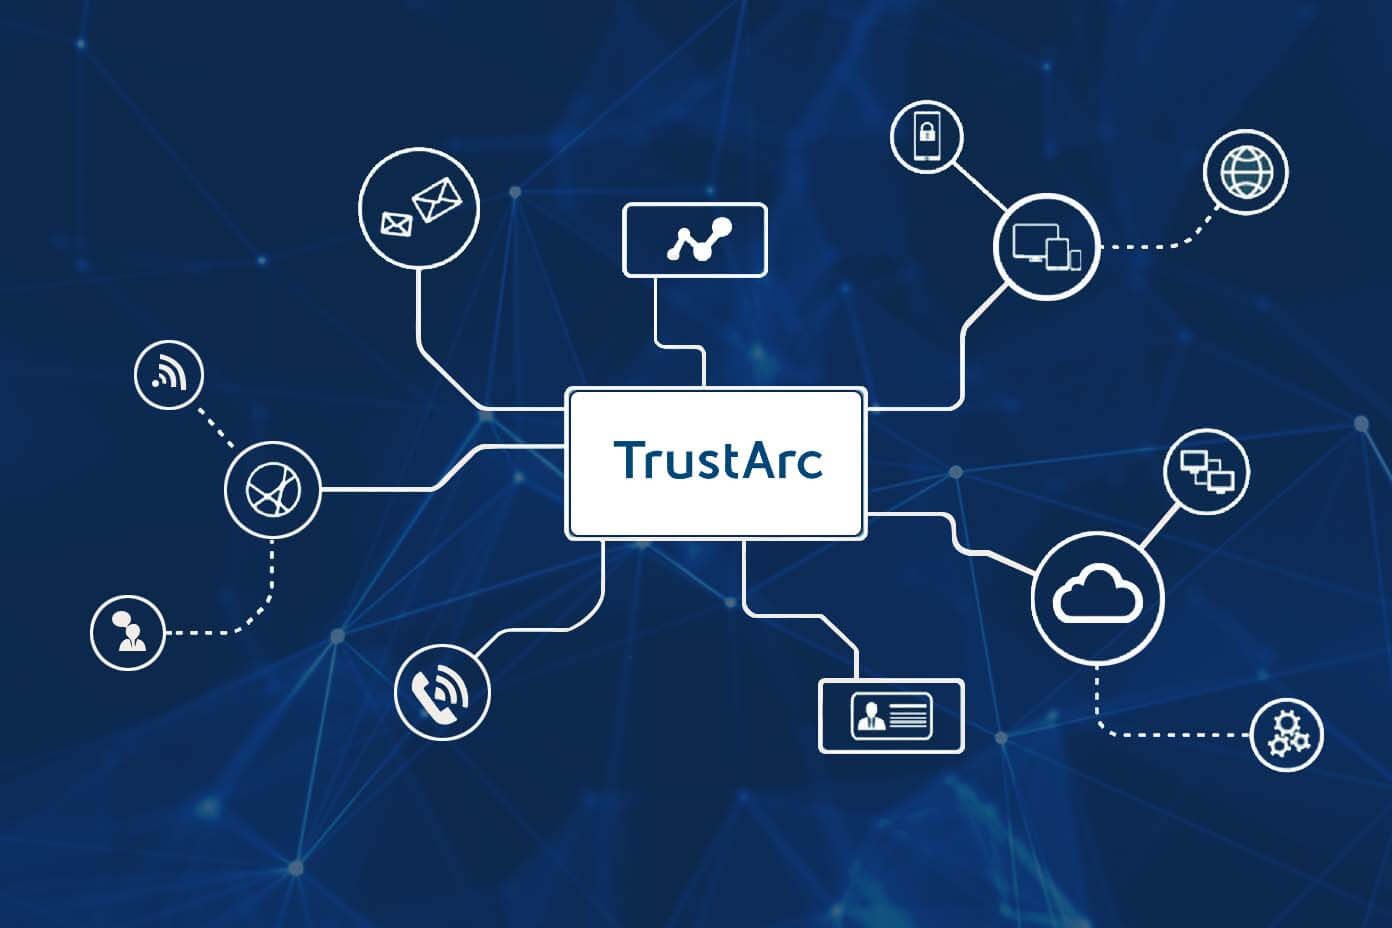 TrustArc Transforming Compliance